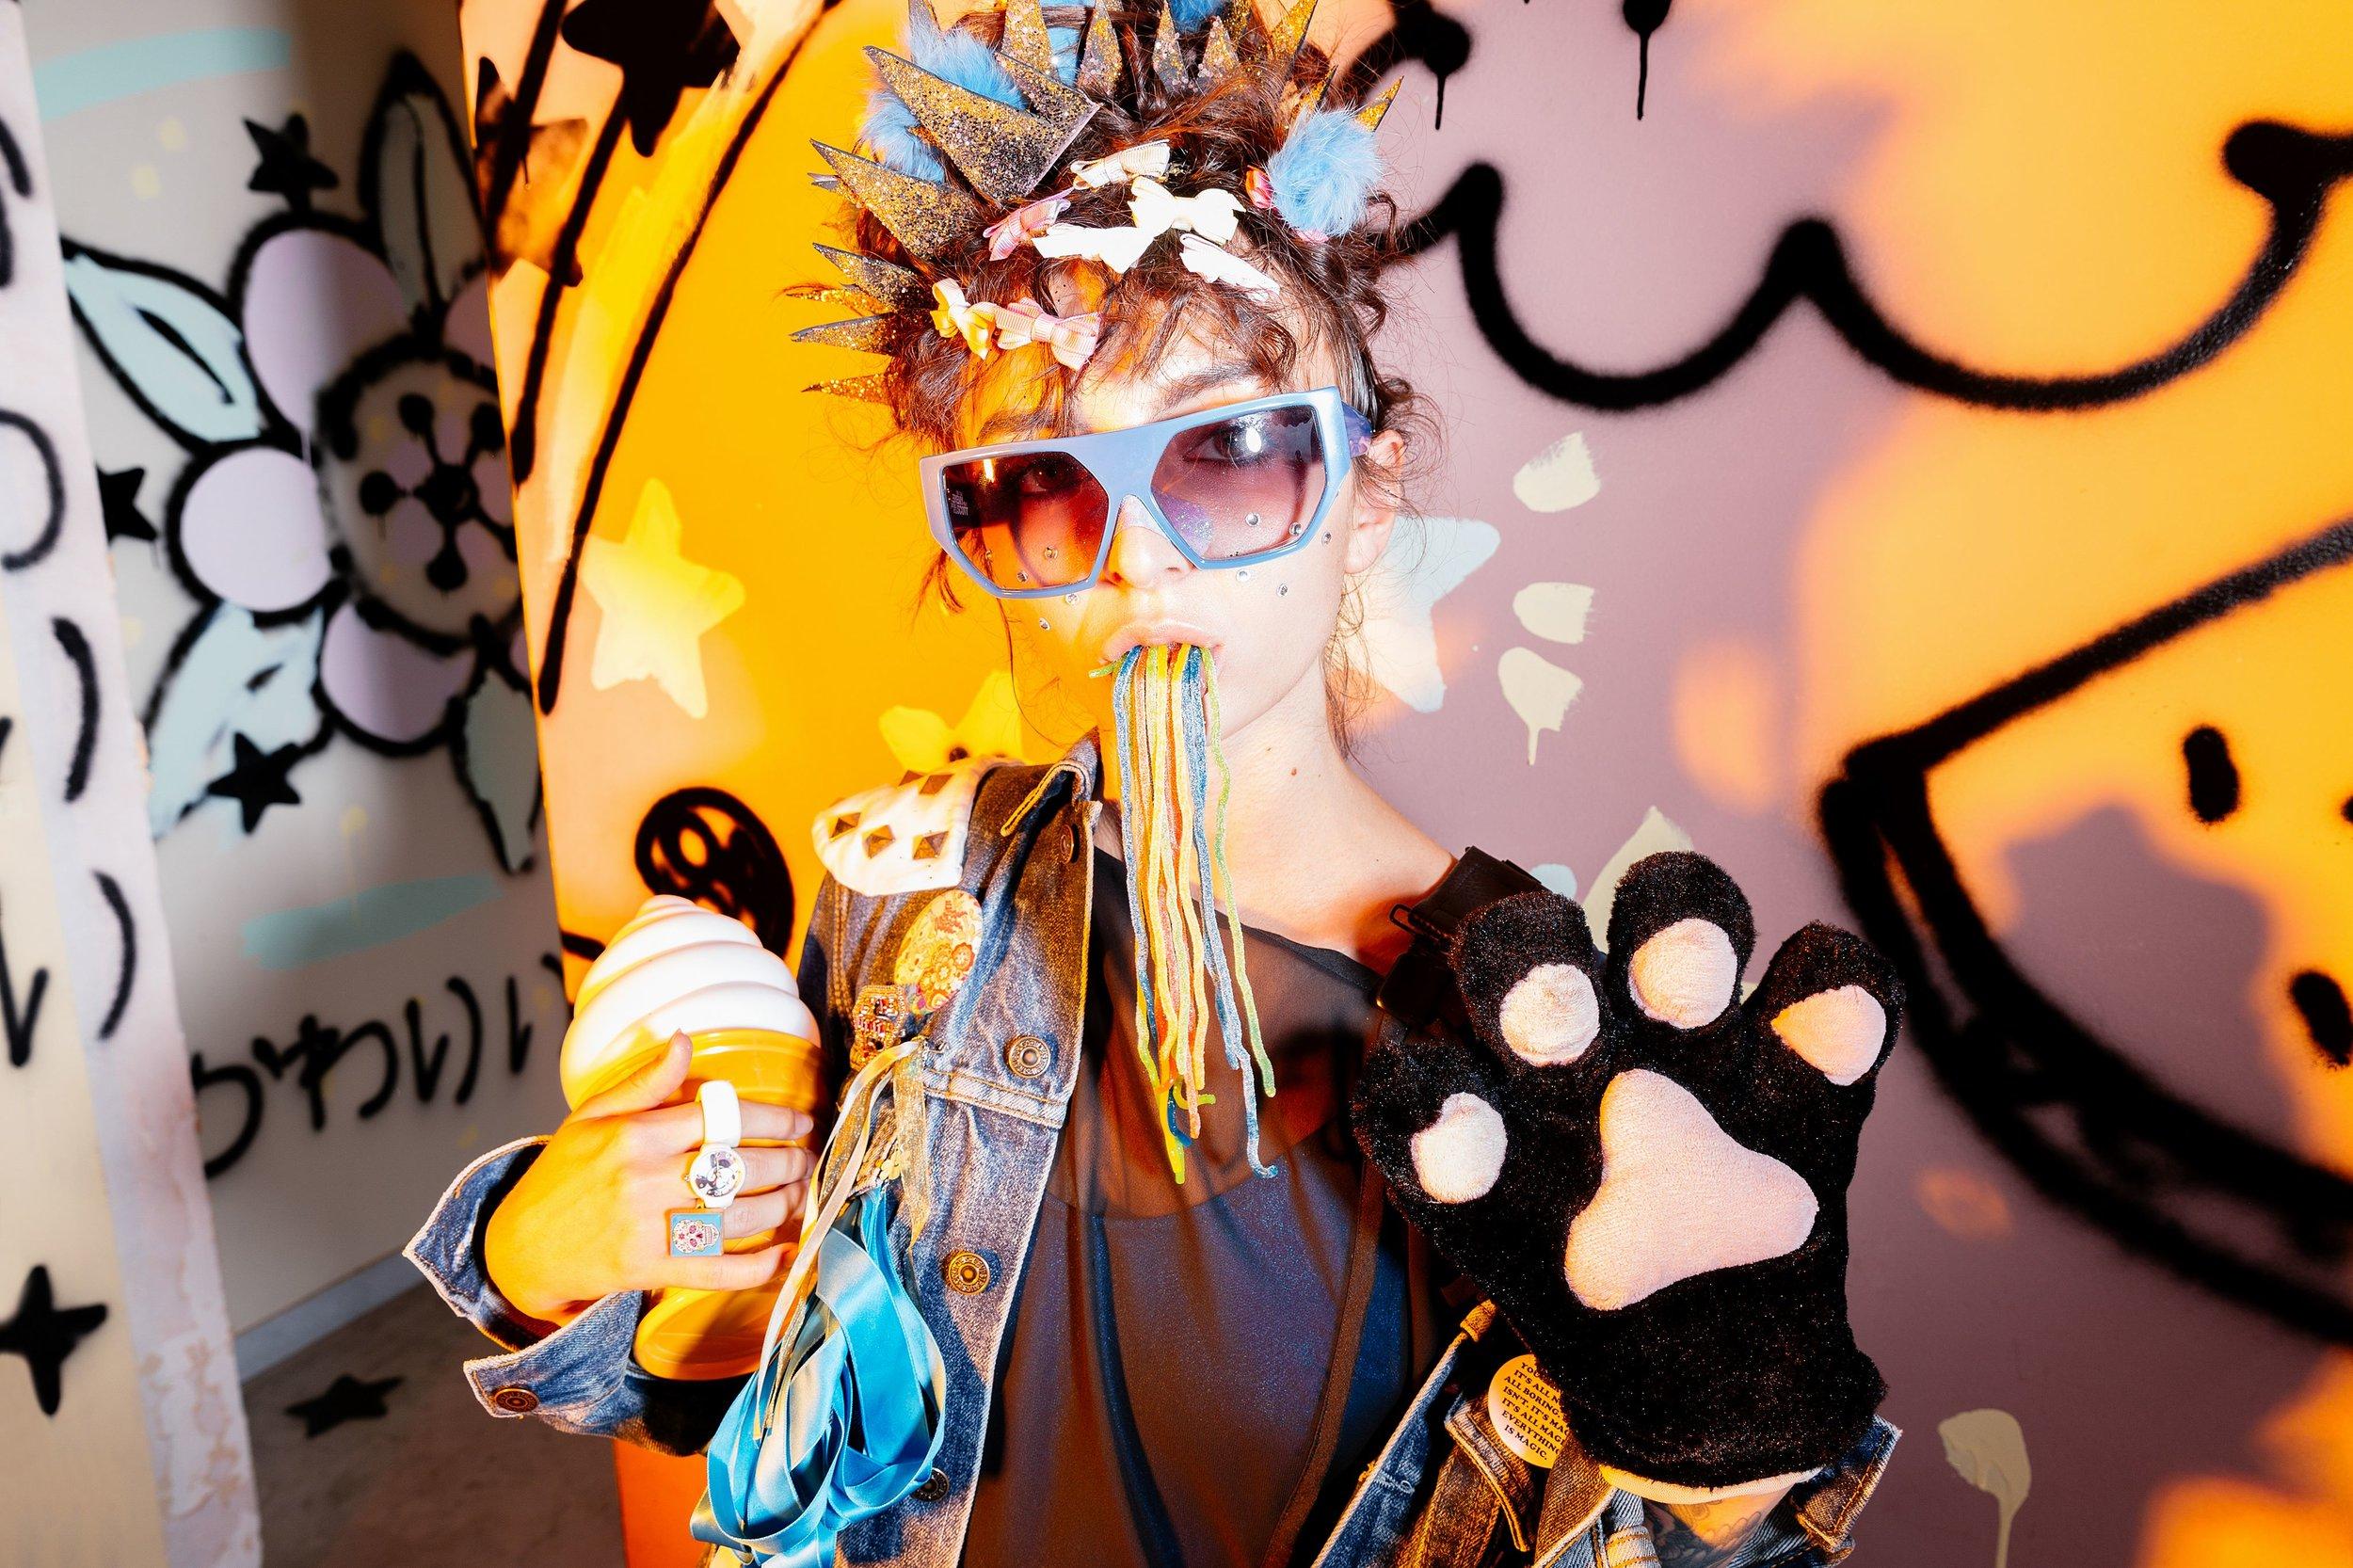 Sunglasses Jeremie Scott for Linda Farrow Gallery - Black dress under jacket by Jean Angie Kaser - Jean Jacket Levi's customized by Flavia Cannata - all accessories from Harajuku Market Japan Tokyo